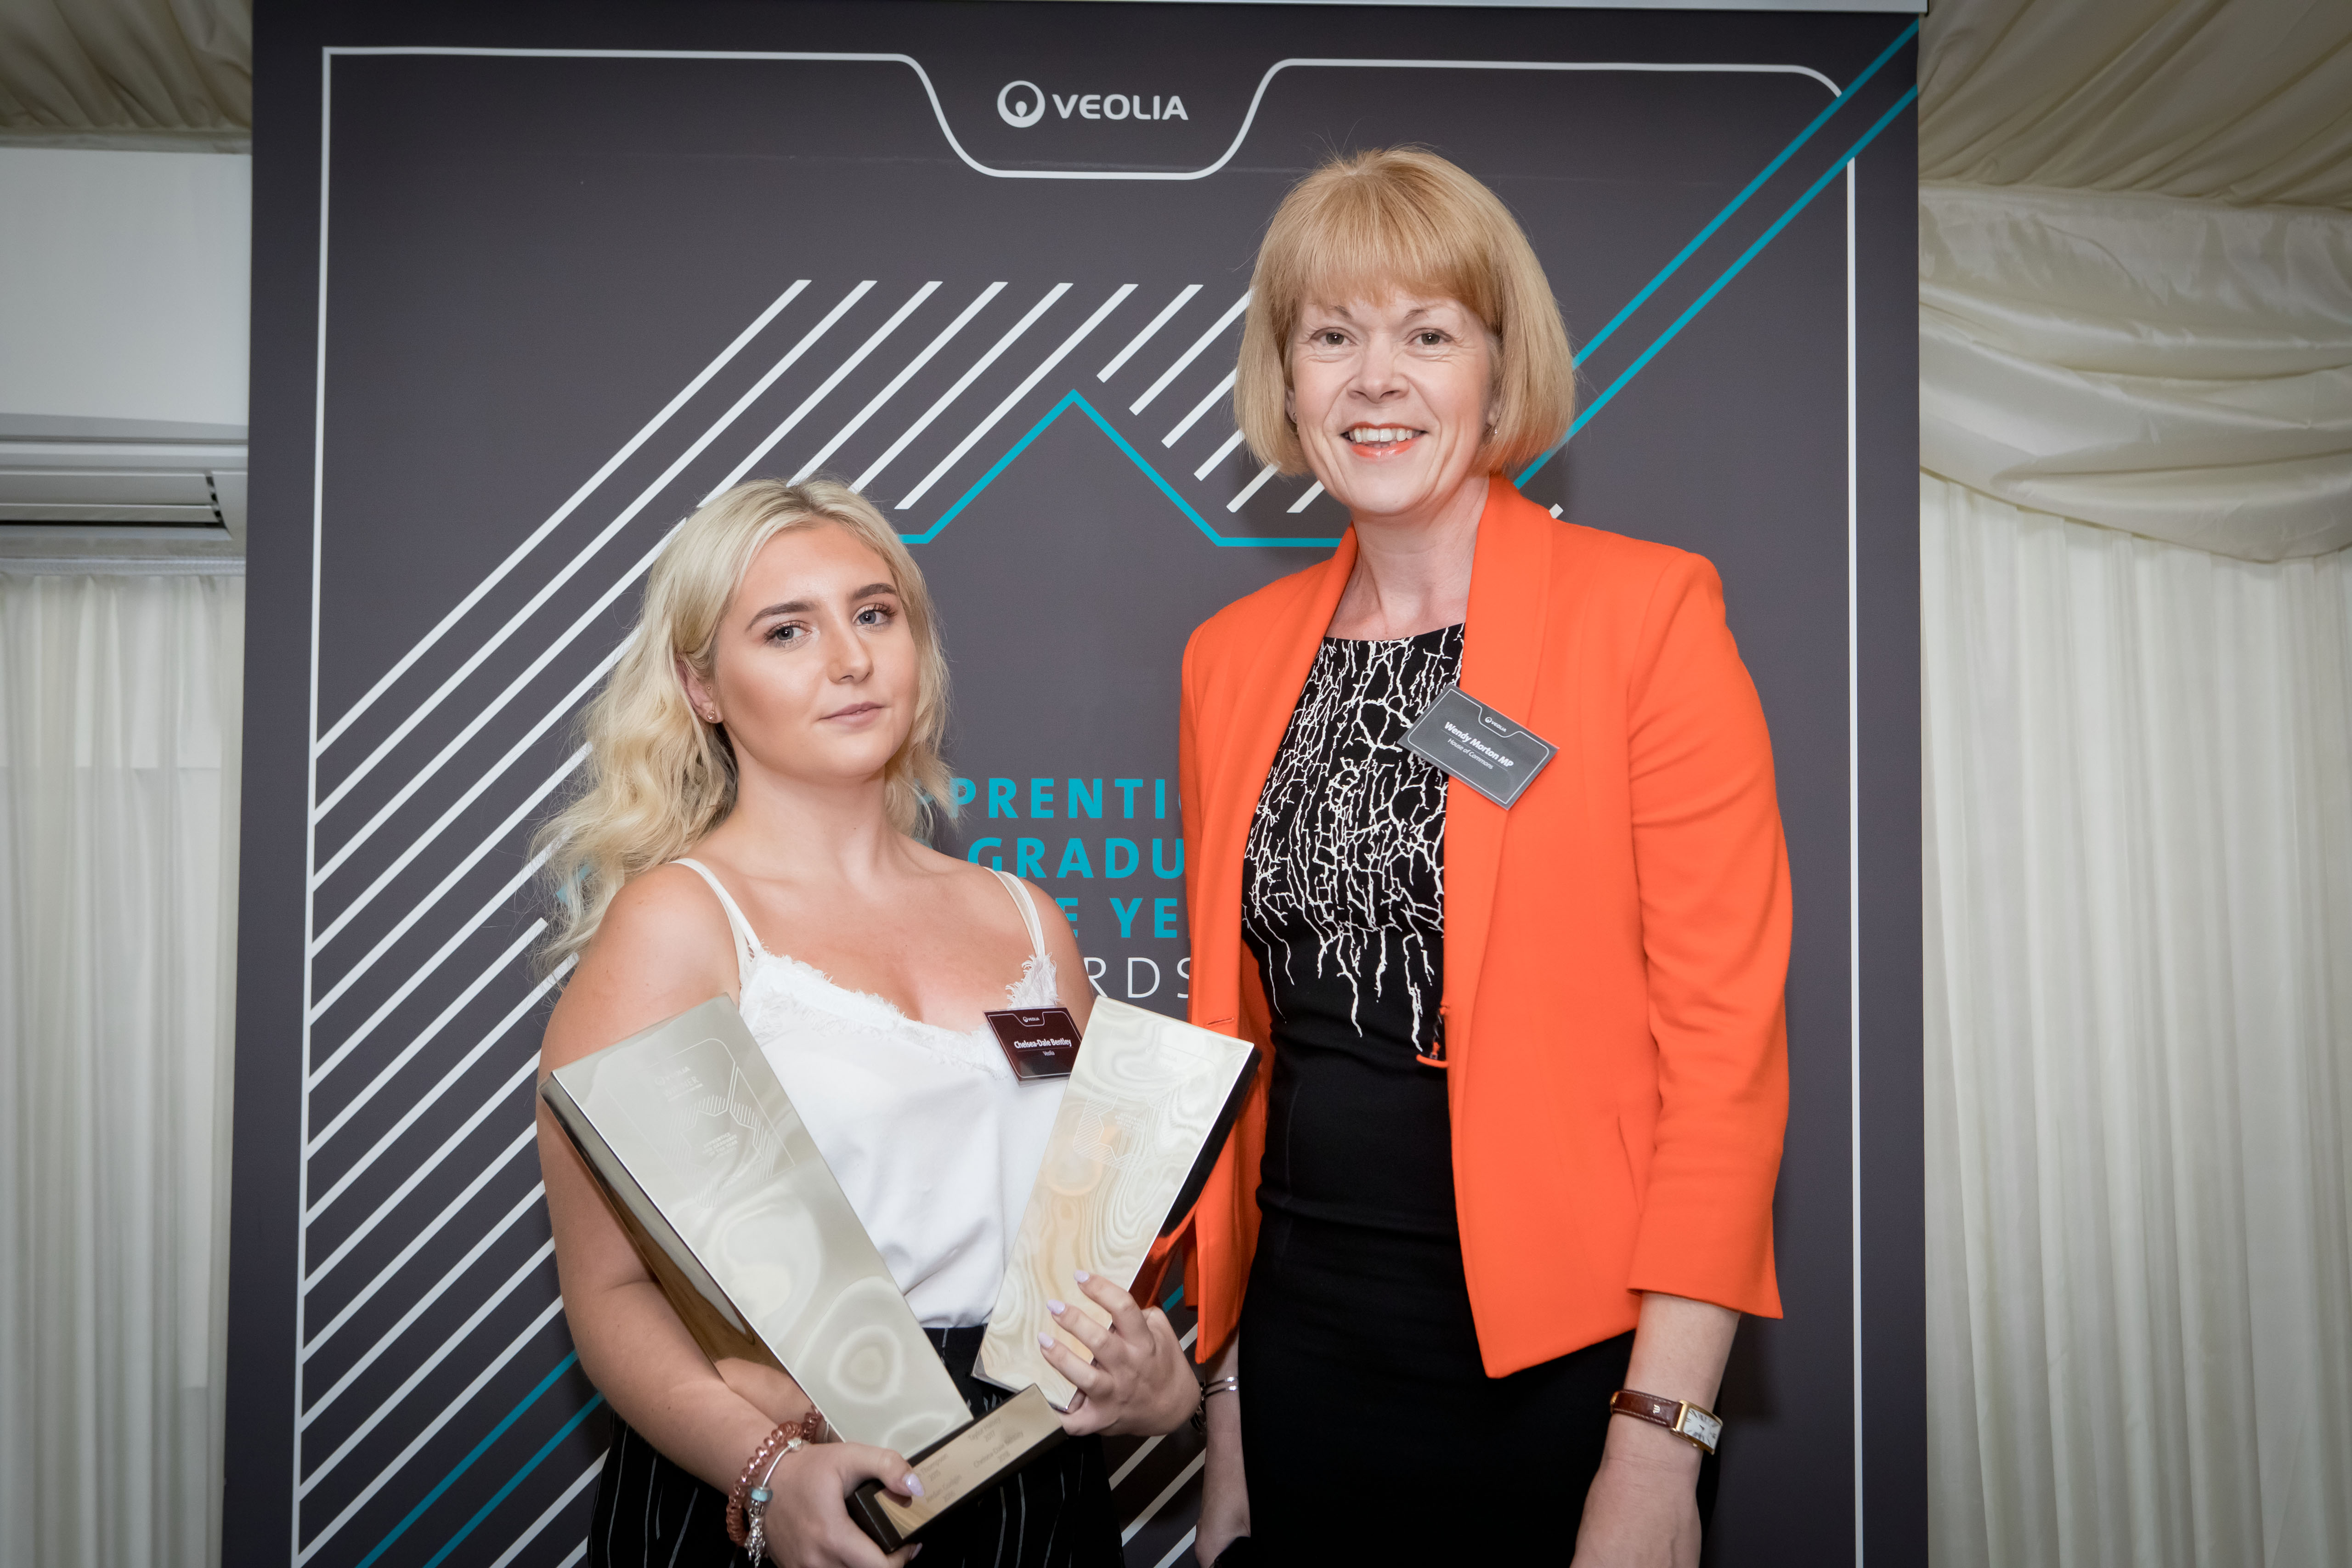 Celebrating Success at the Veolia Awards